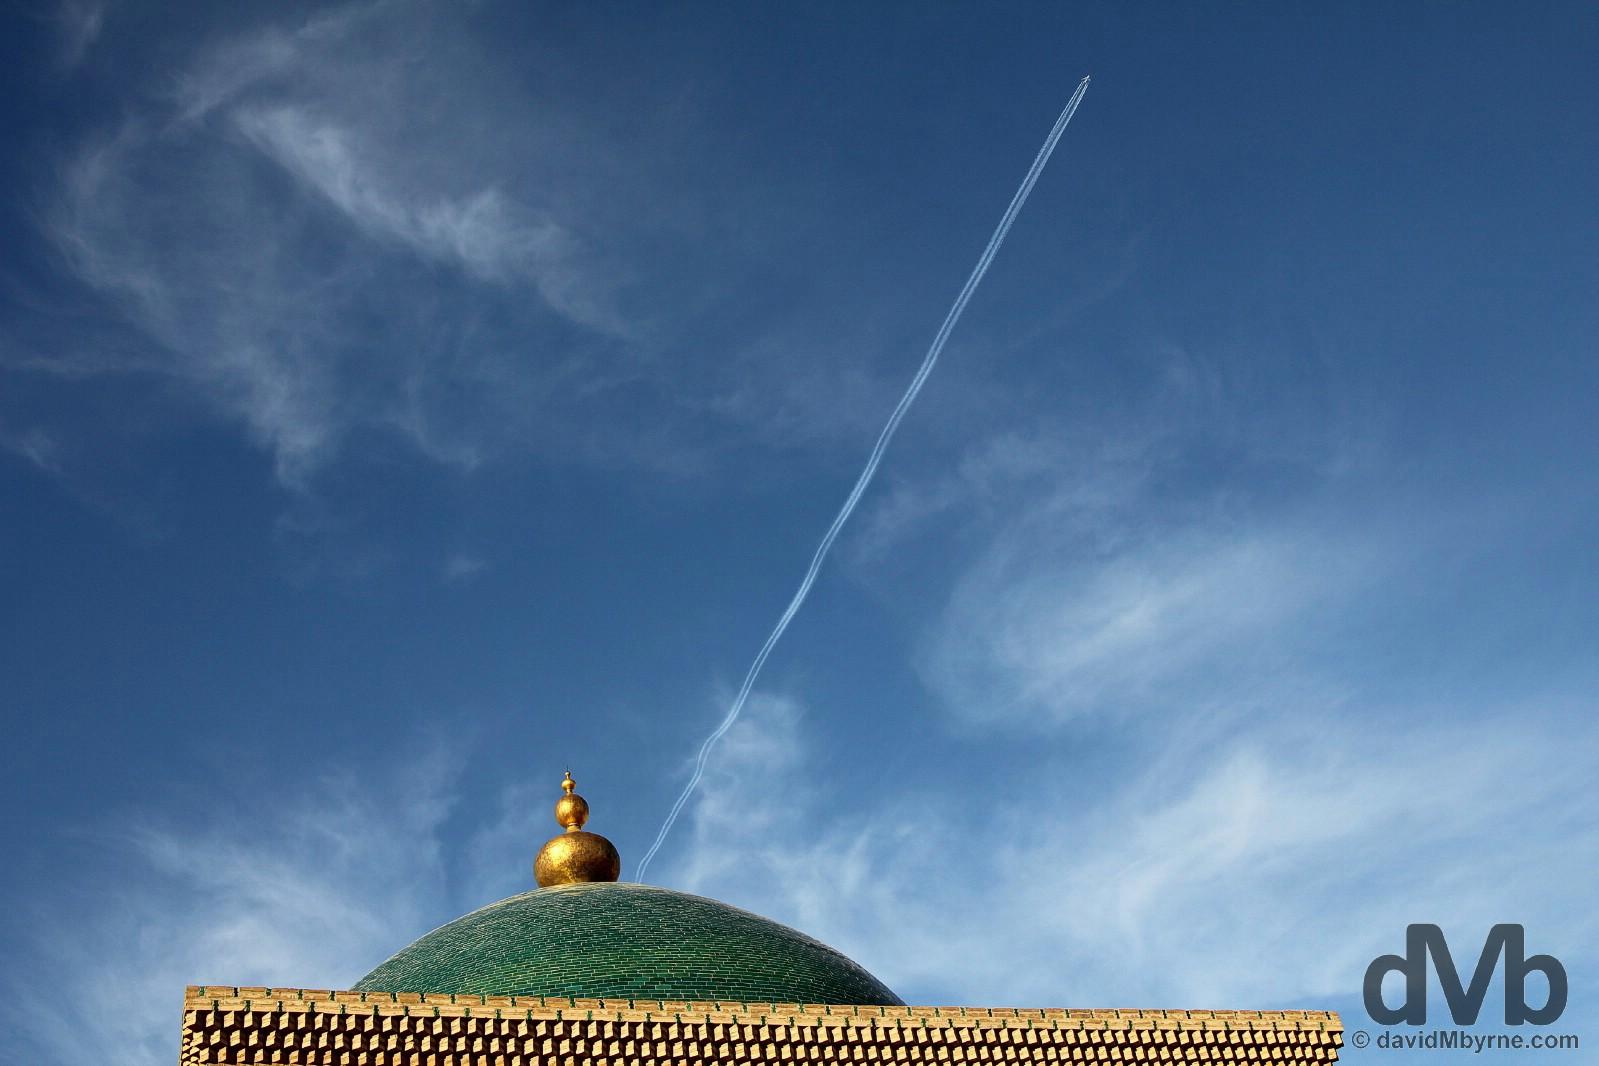 Skies above the Pahlavon Mahmud Mausoleum in Khiva, Uzbekistan. March 14, 2015.